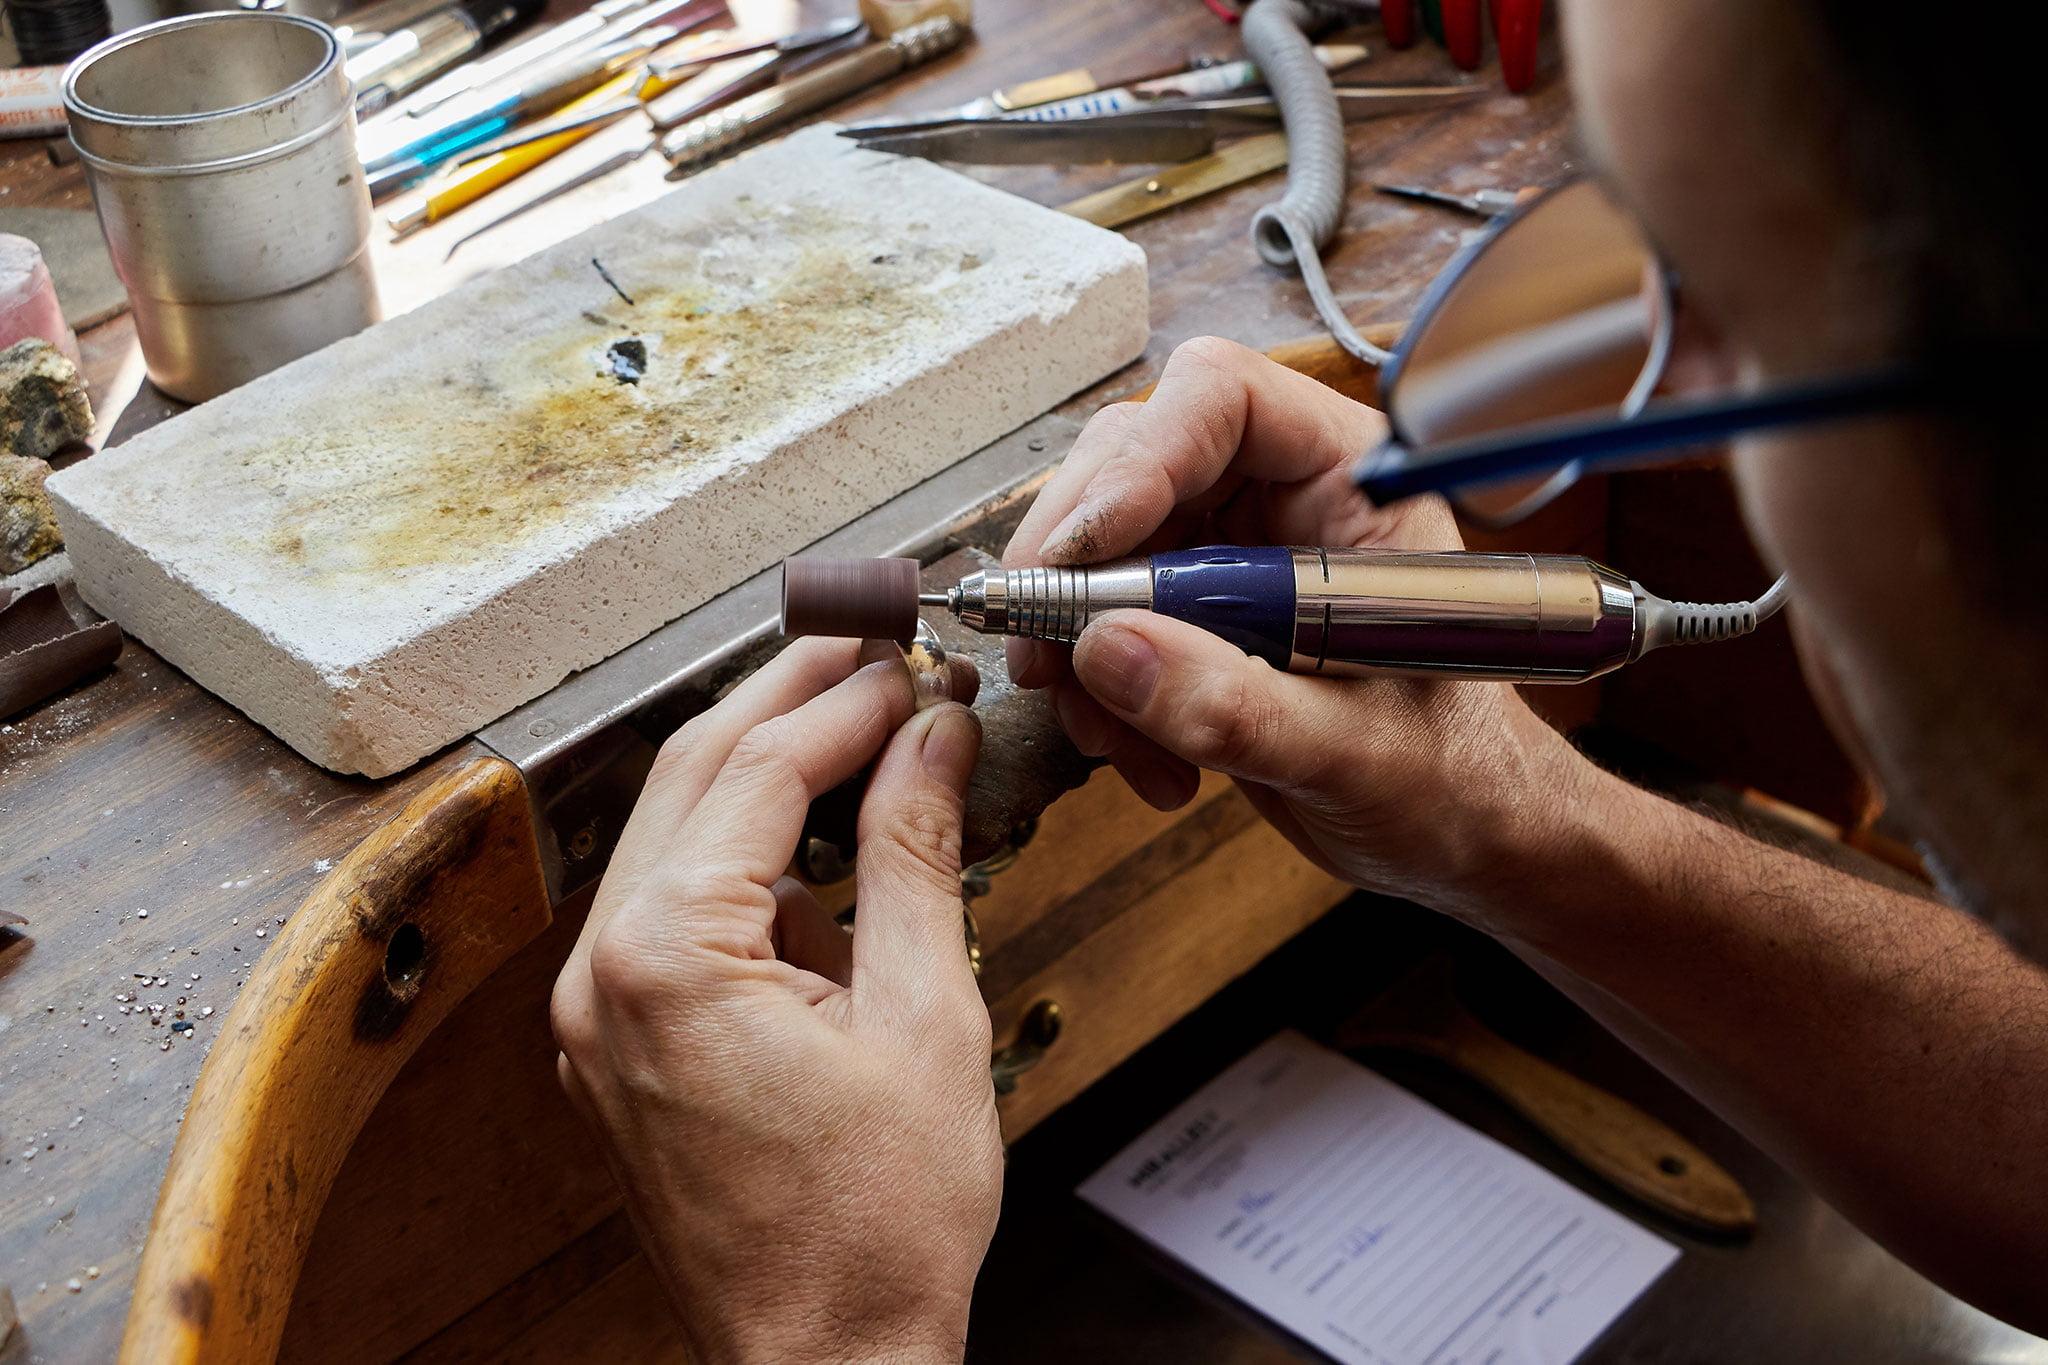 Reparación de joyas en Dénia – Joyería Bonilla